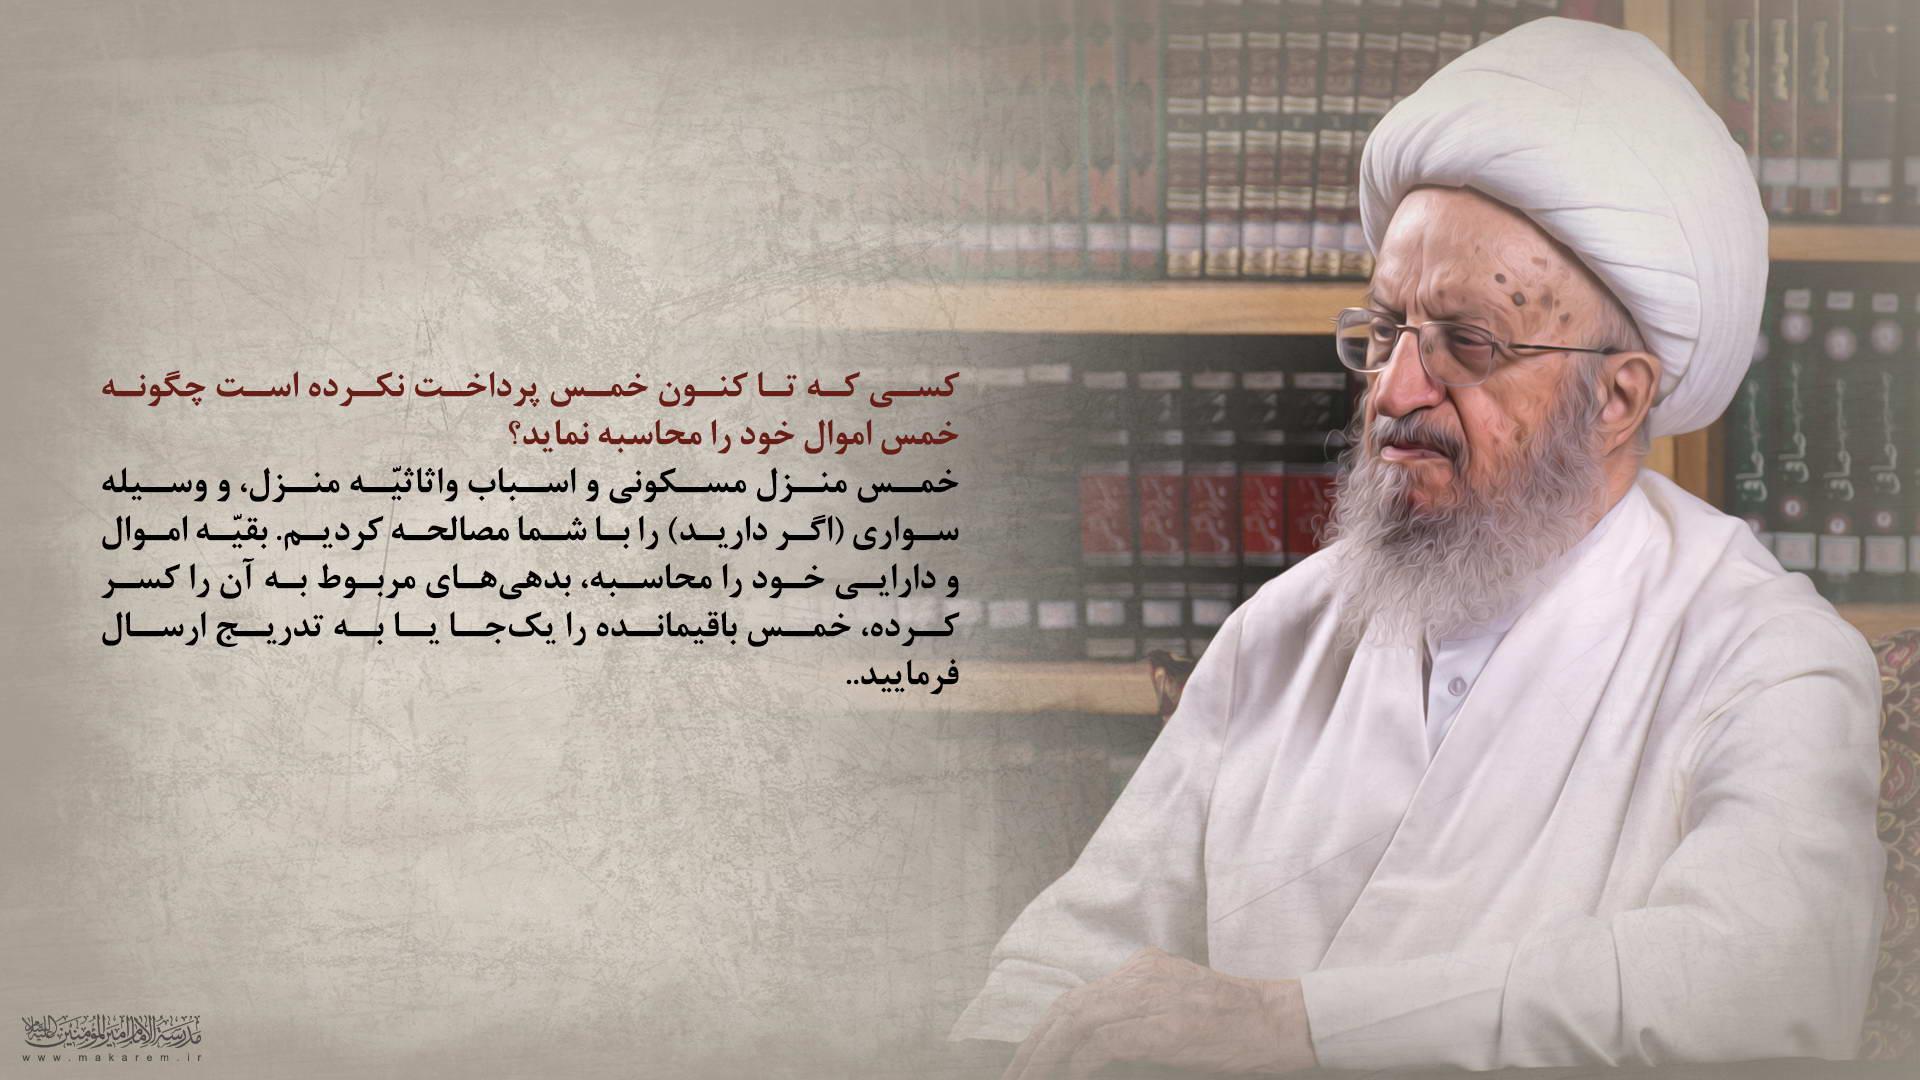 کثیر 04-مدرسه الامام امیر المومنین (ع)